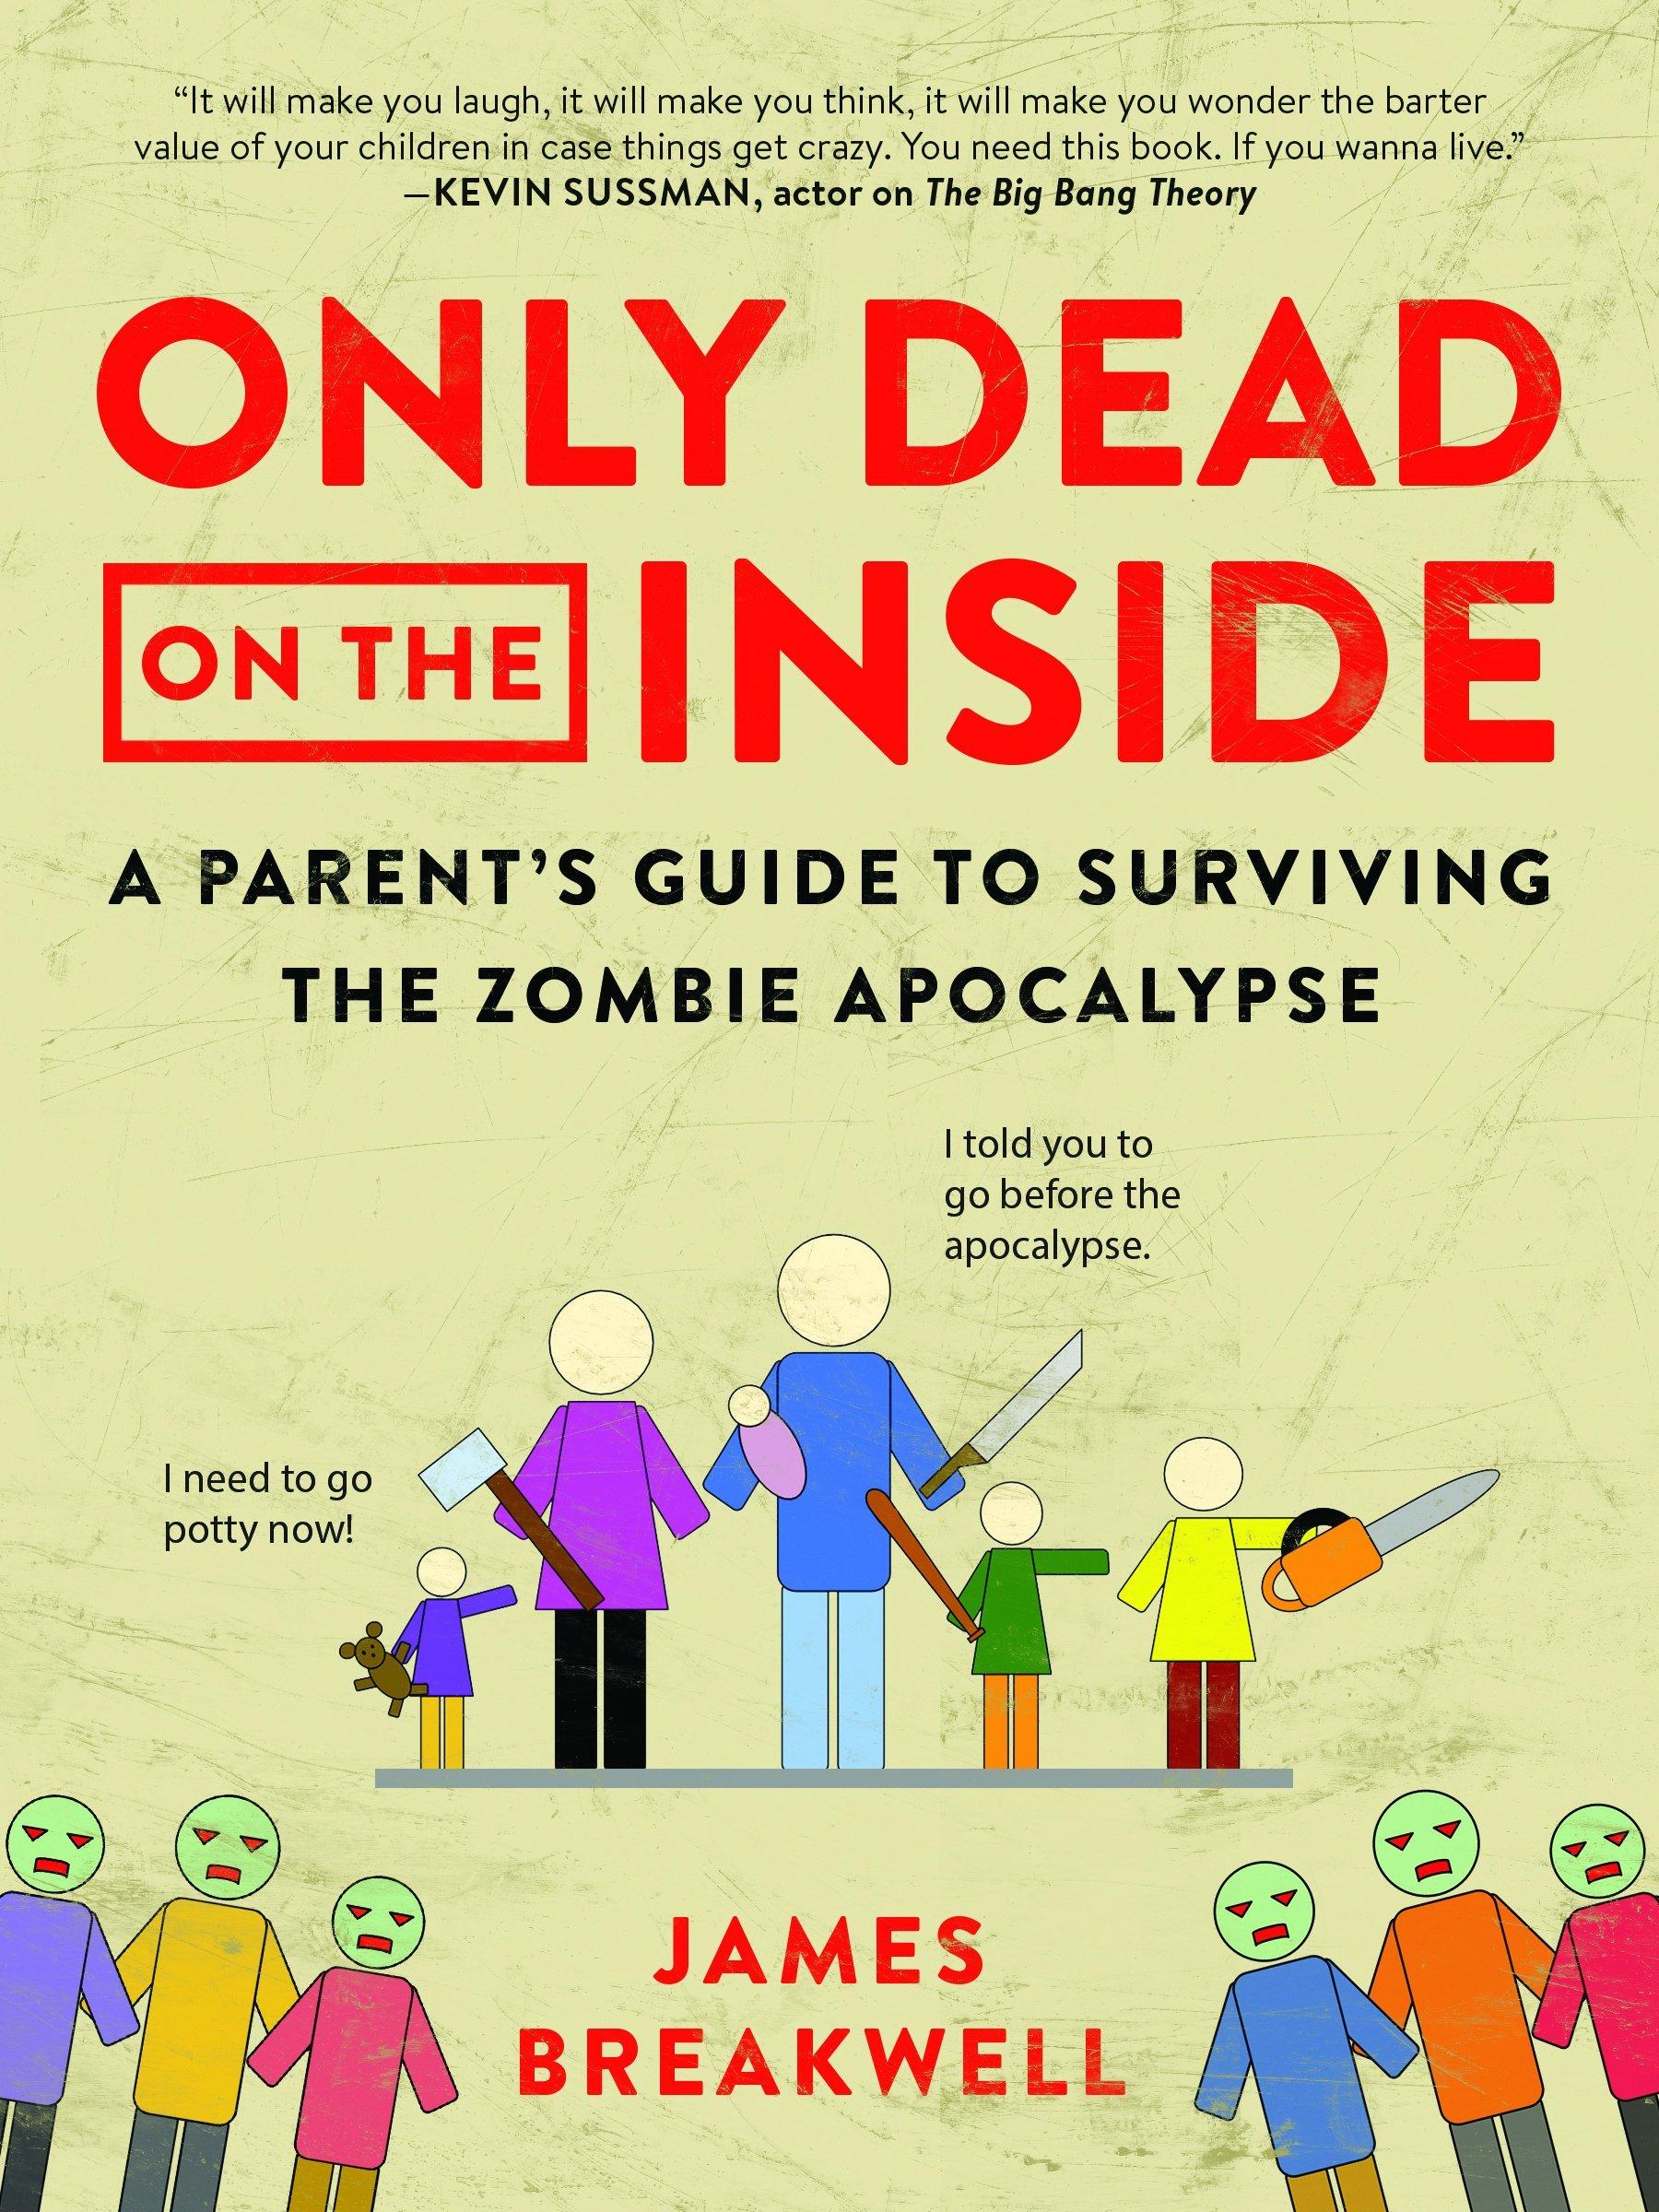 Parents need help during the zombie apocalypse, too.